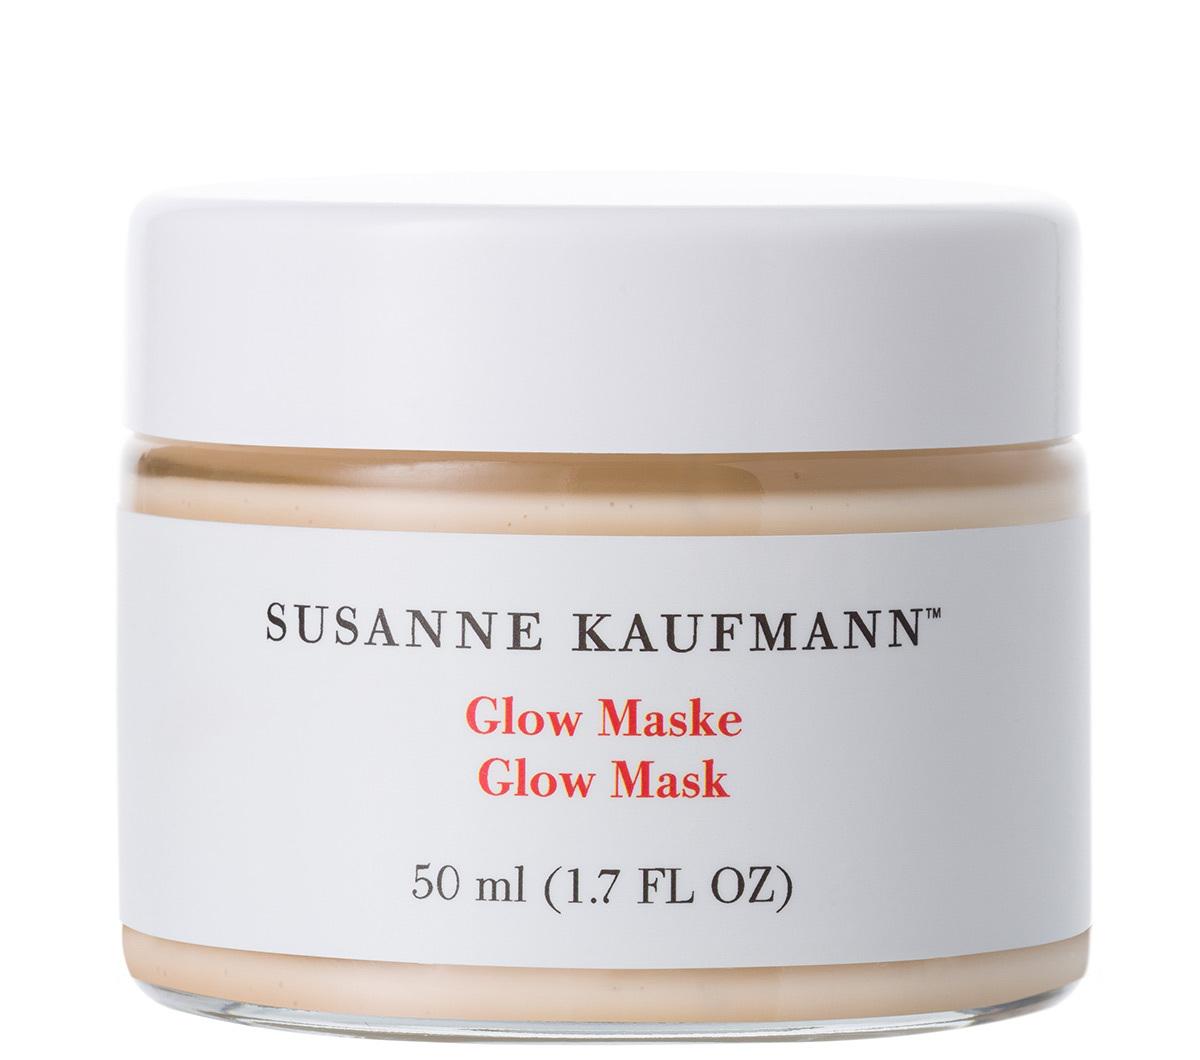 Susanne kaufmann glow maske